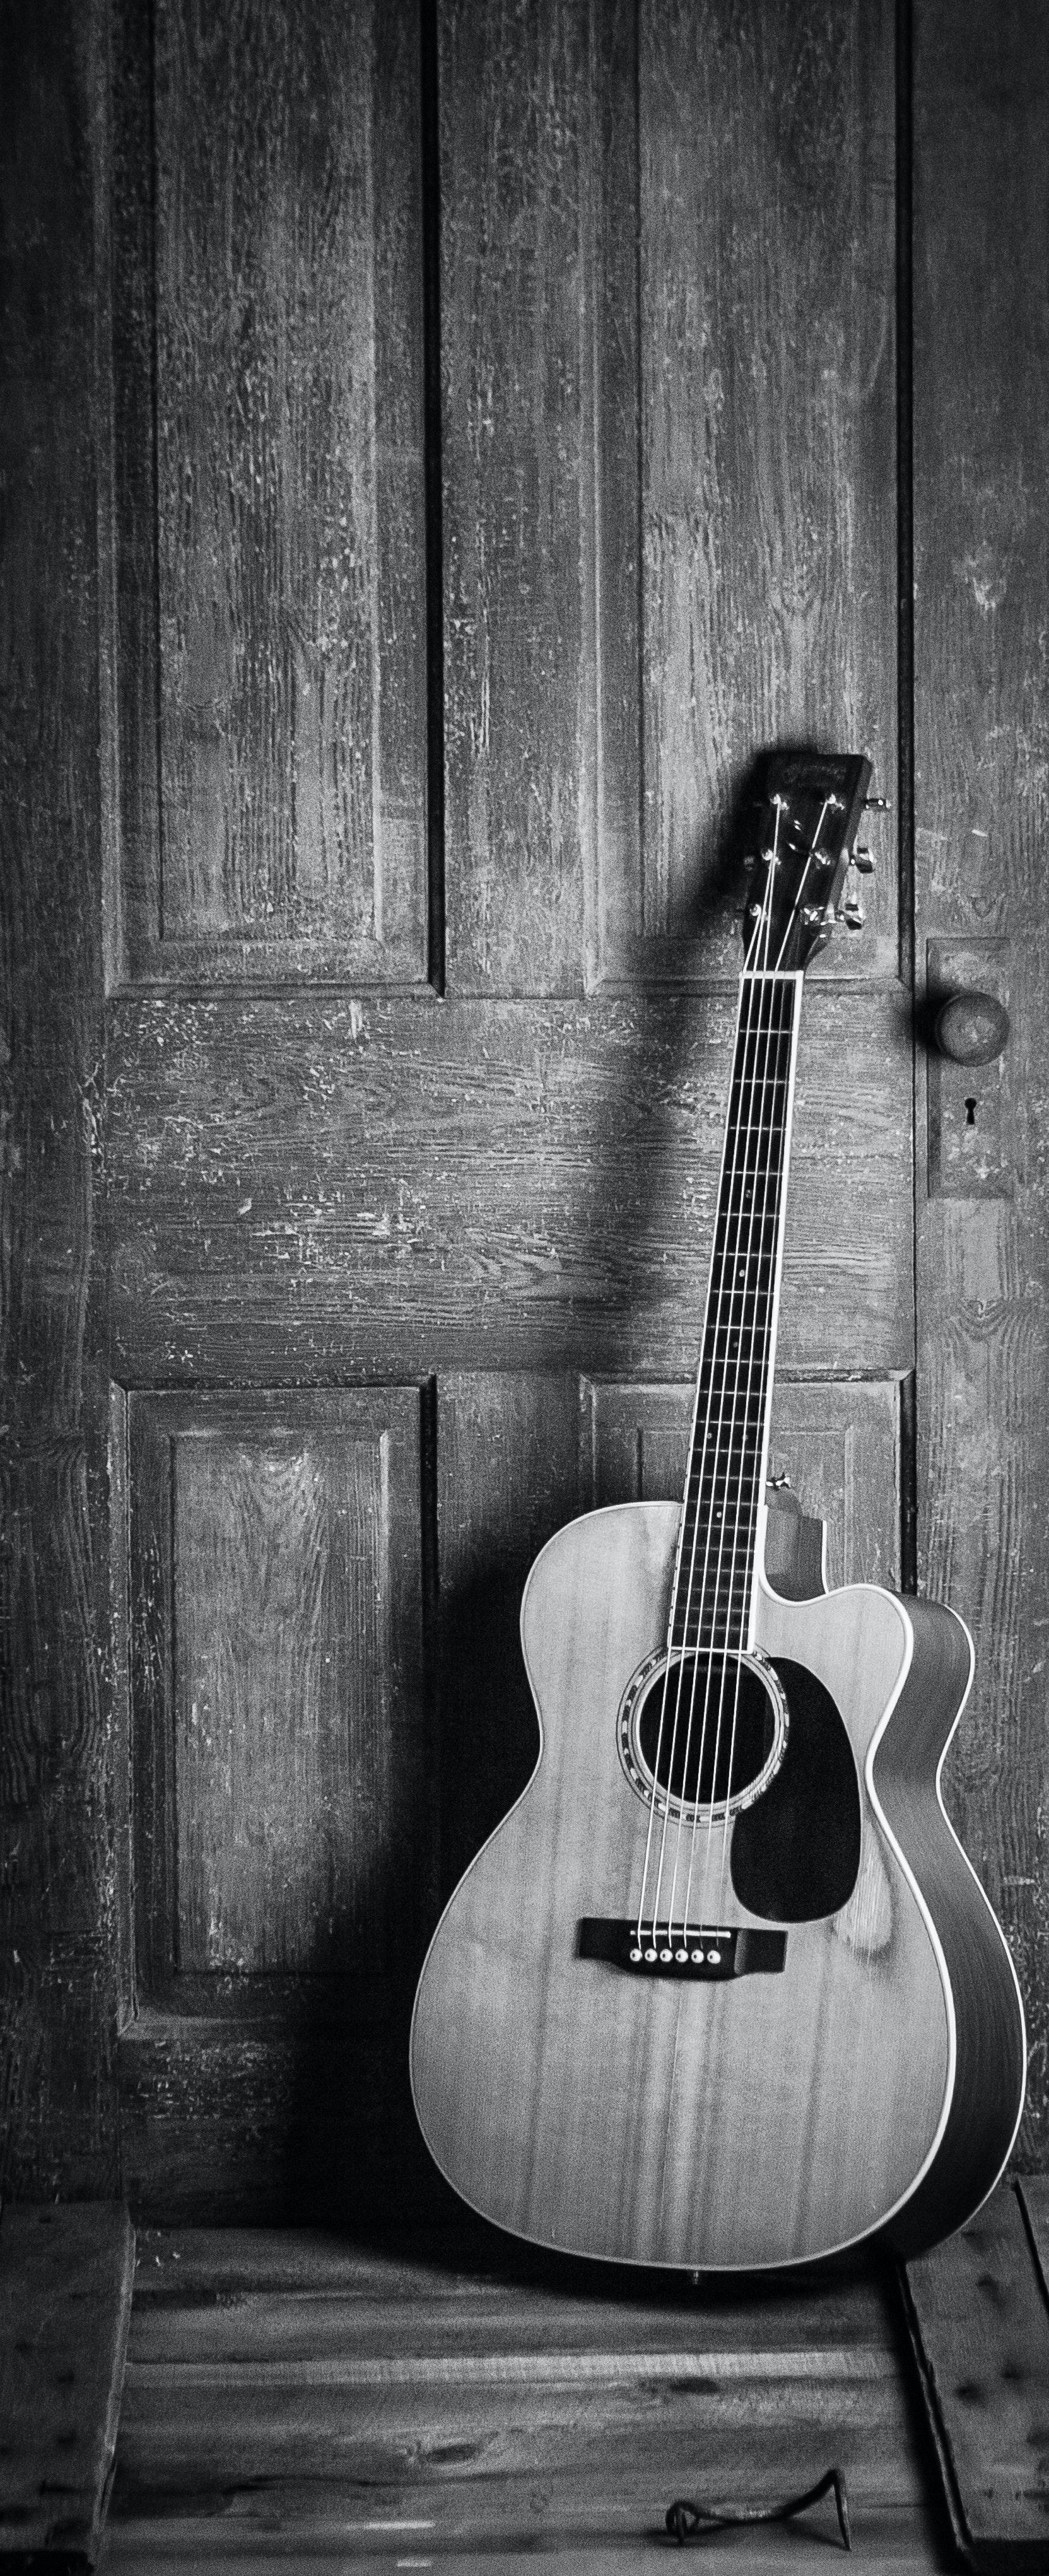 250 beautiful guitar photos pexels free stock photos. Black Bedroom Furniture Sets. Home Design Ideas